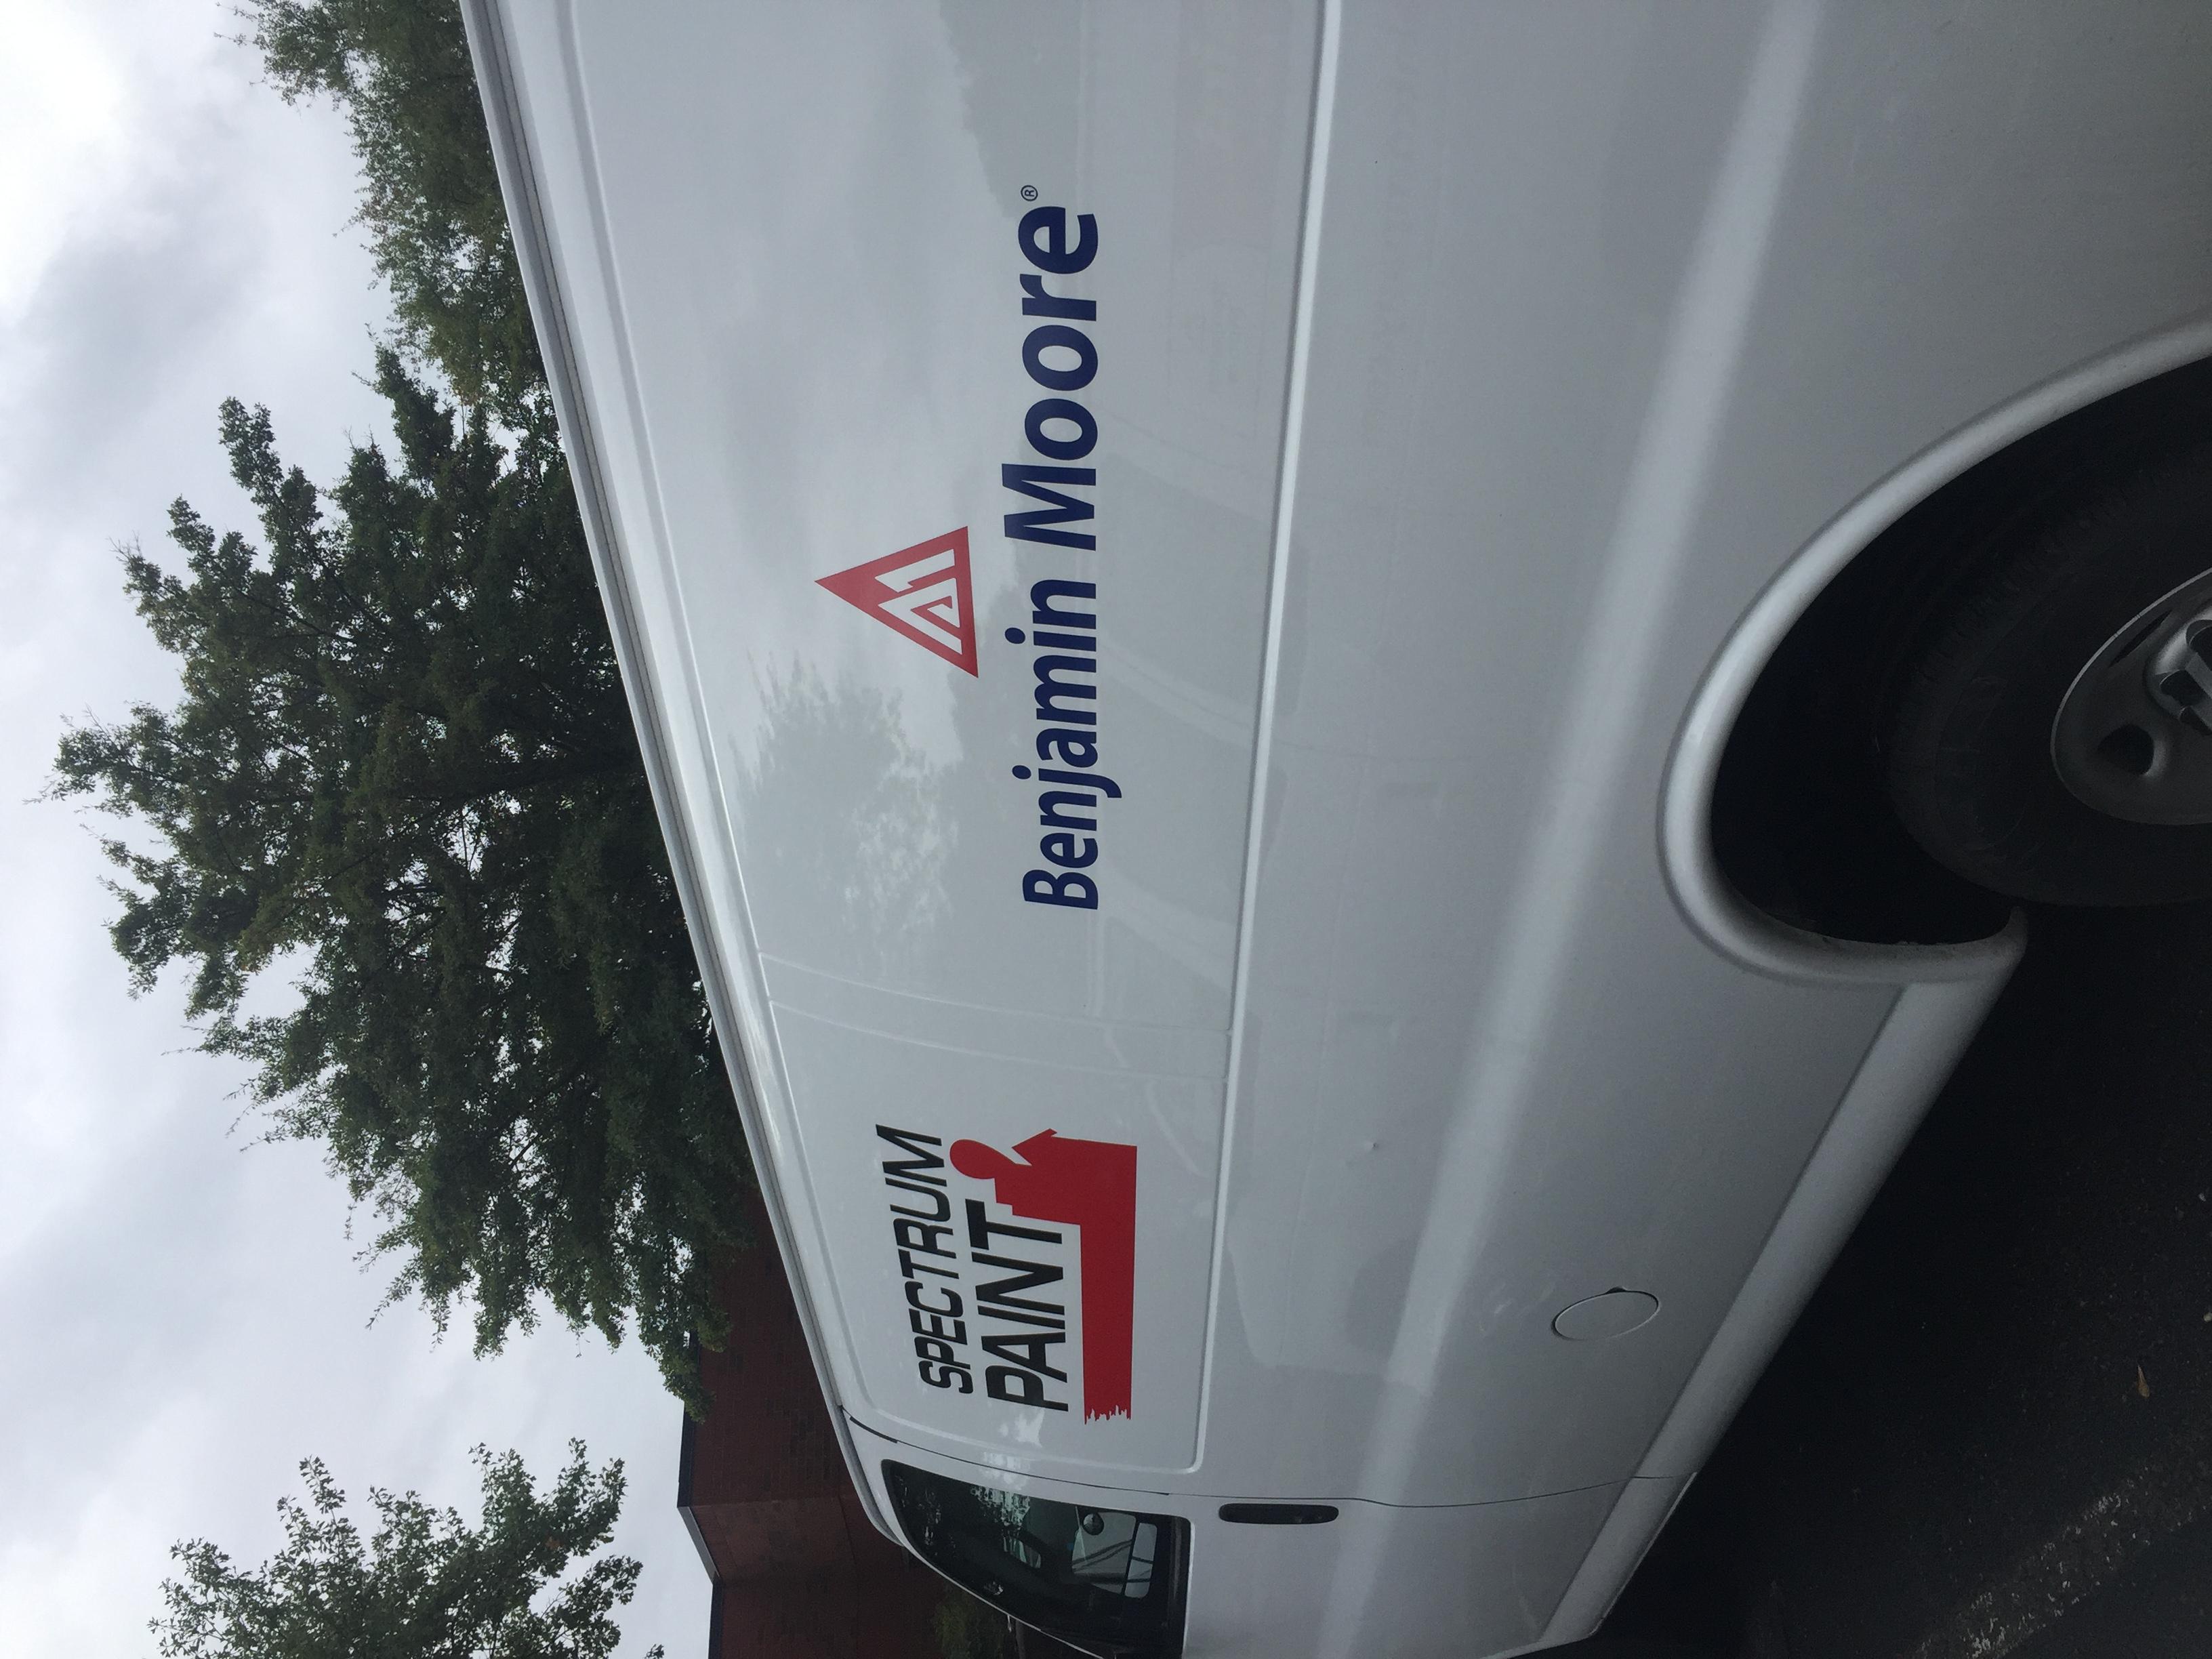 Graphics on side panels of van